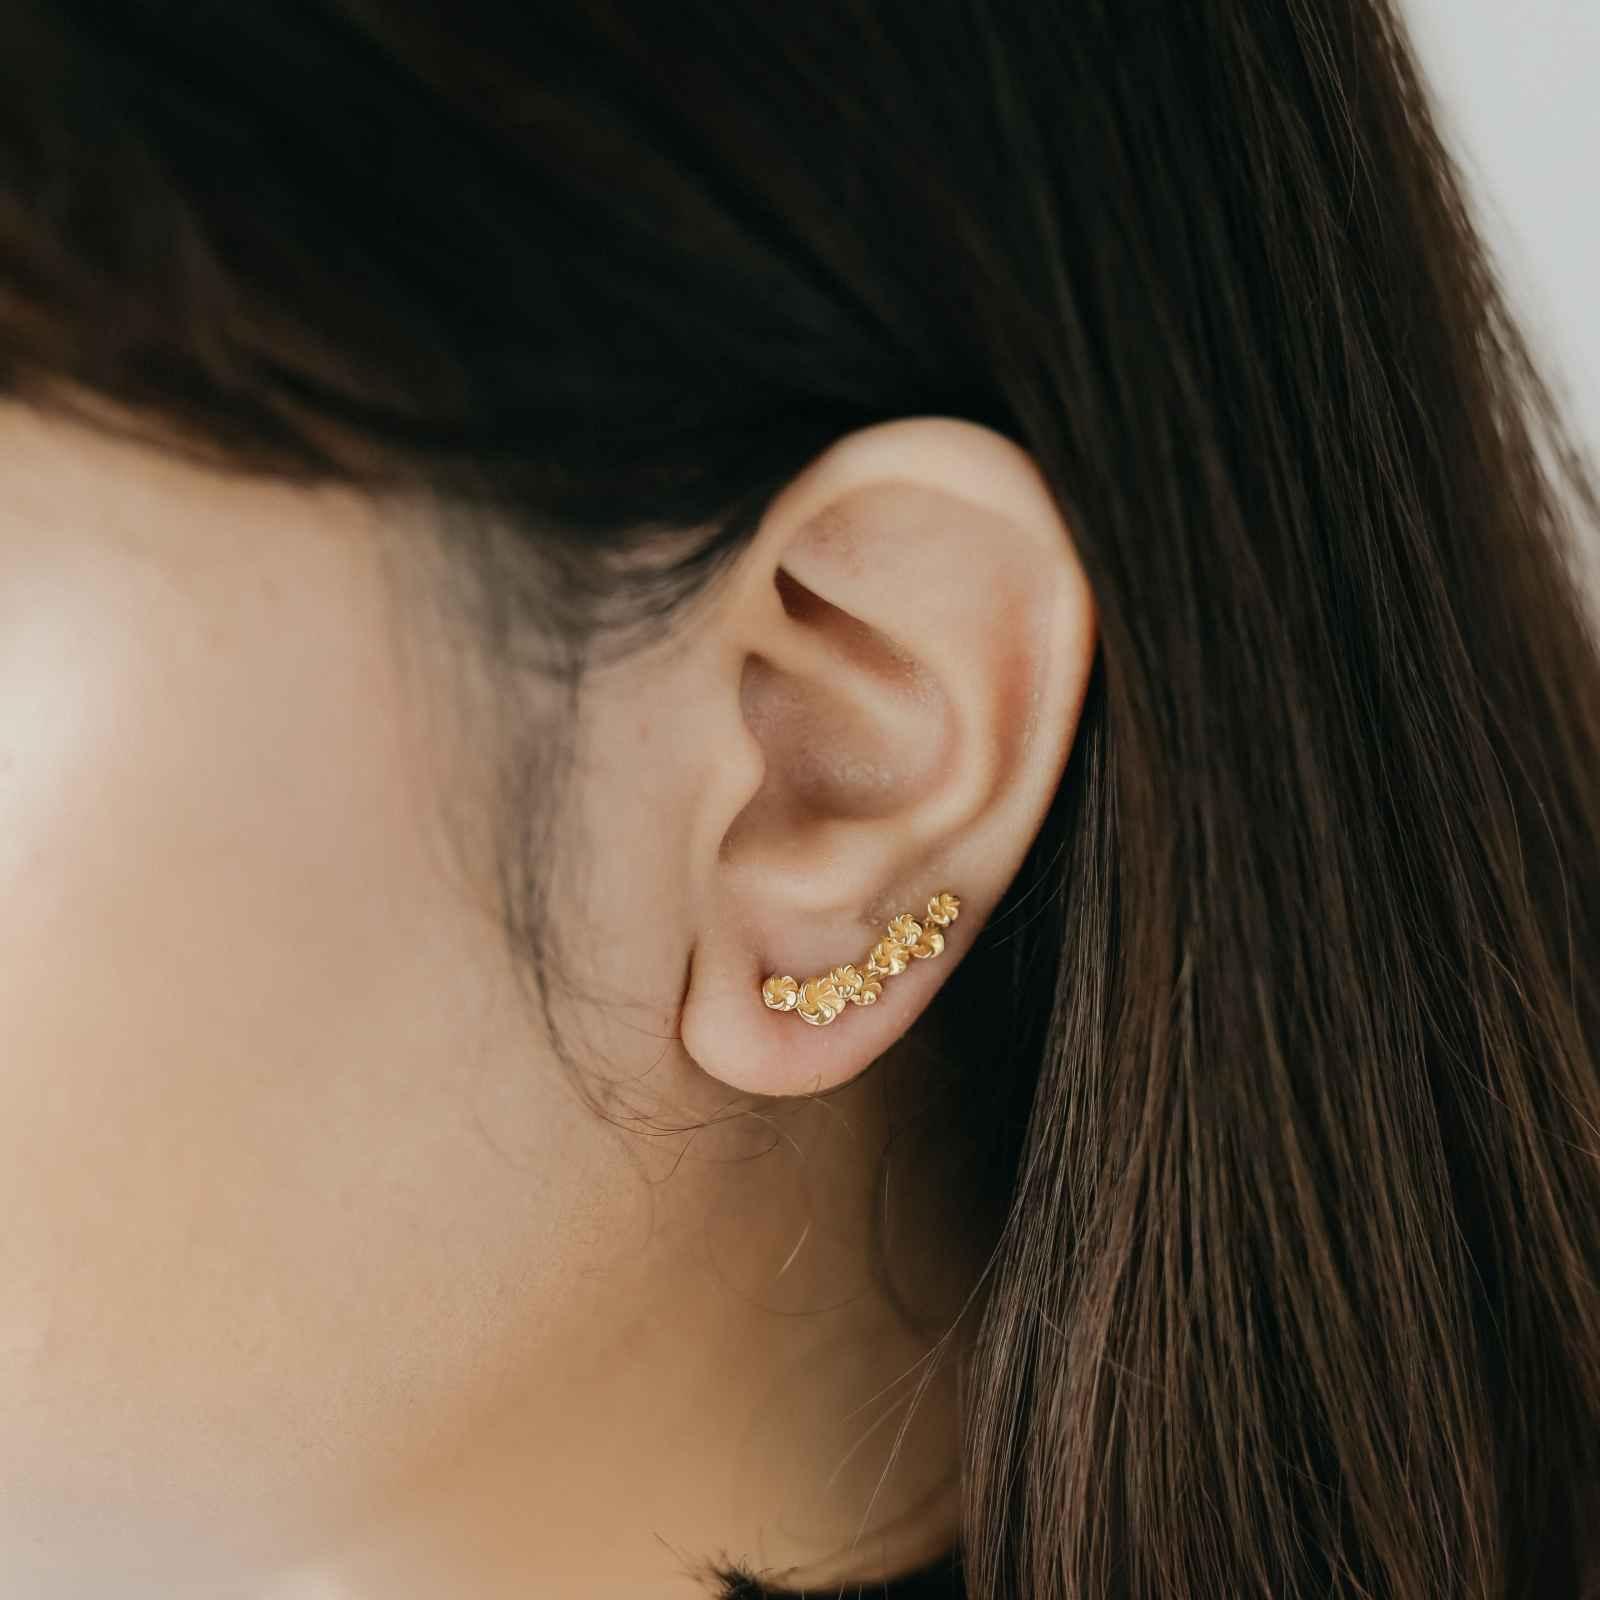 Jepun Ear Climber